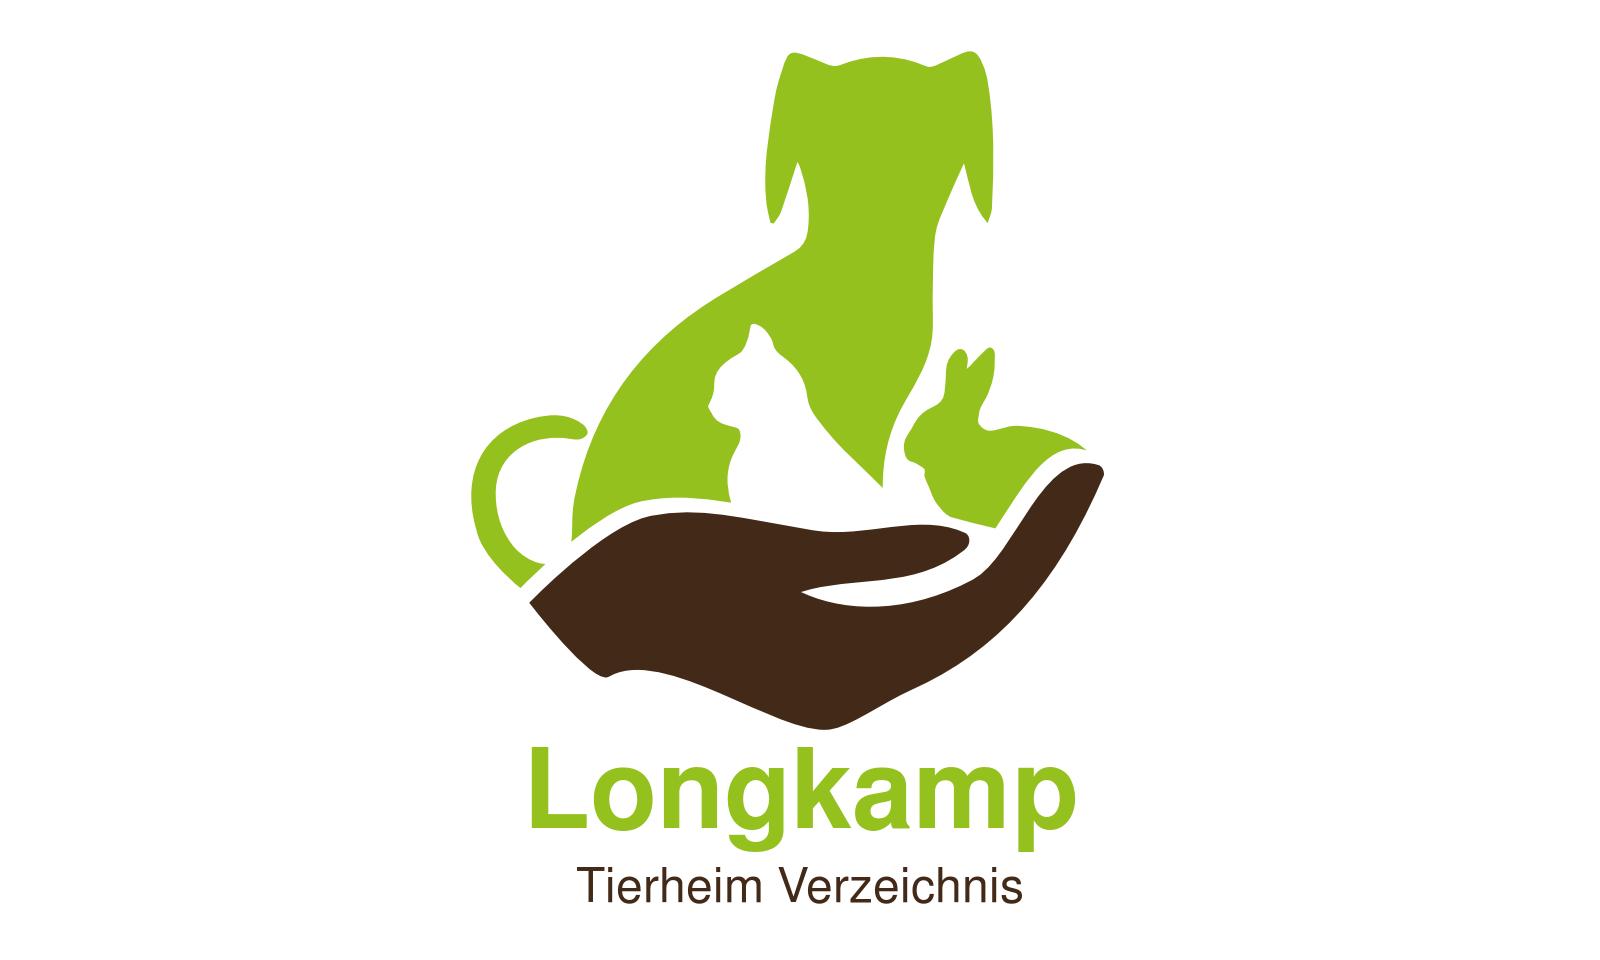 Tierheim Longkamp